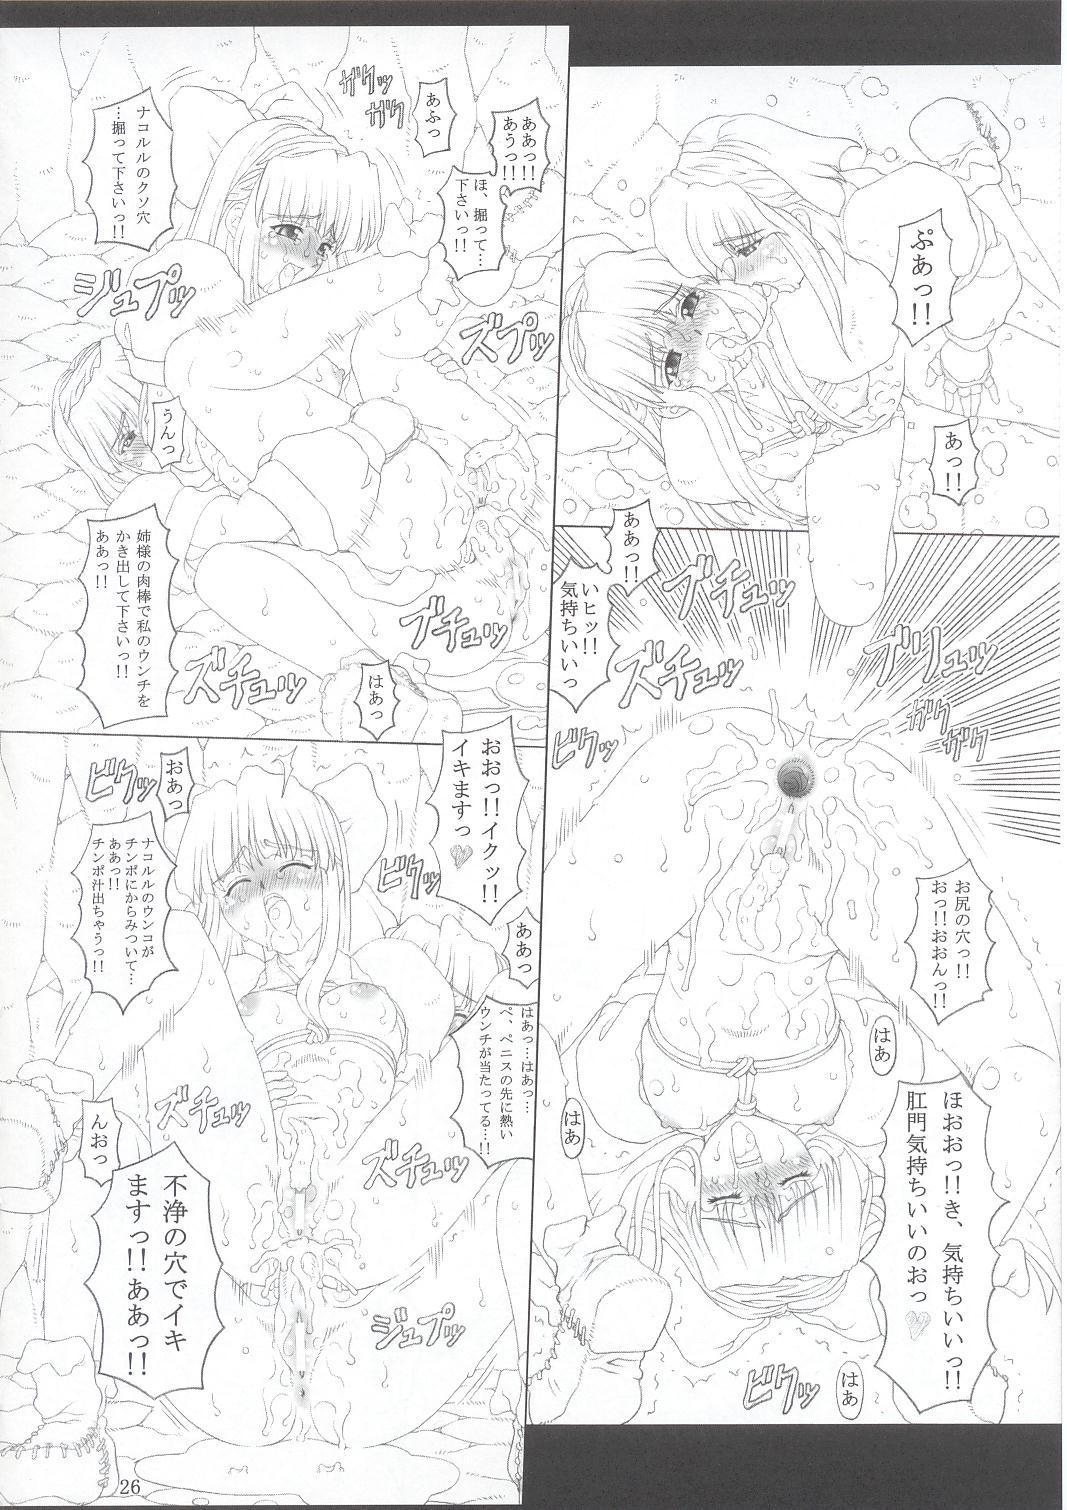 JUNK Dain no Miko San 24